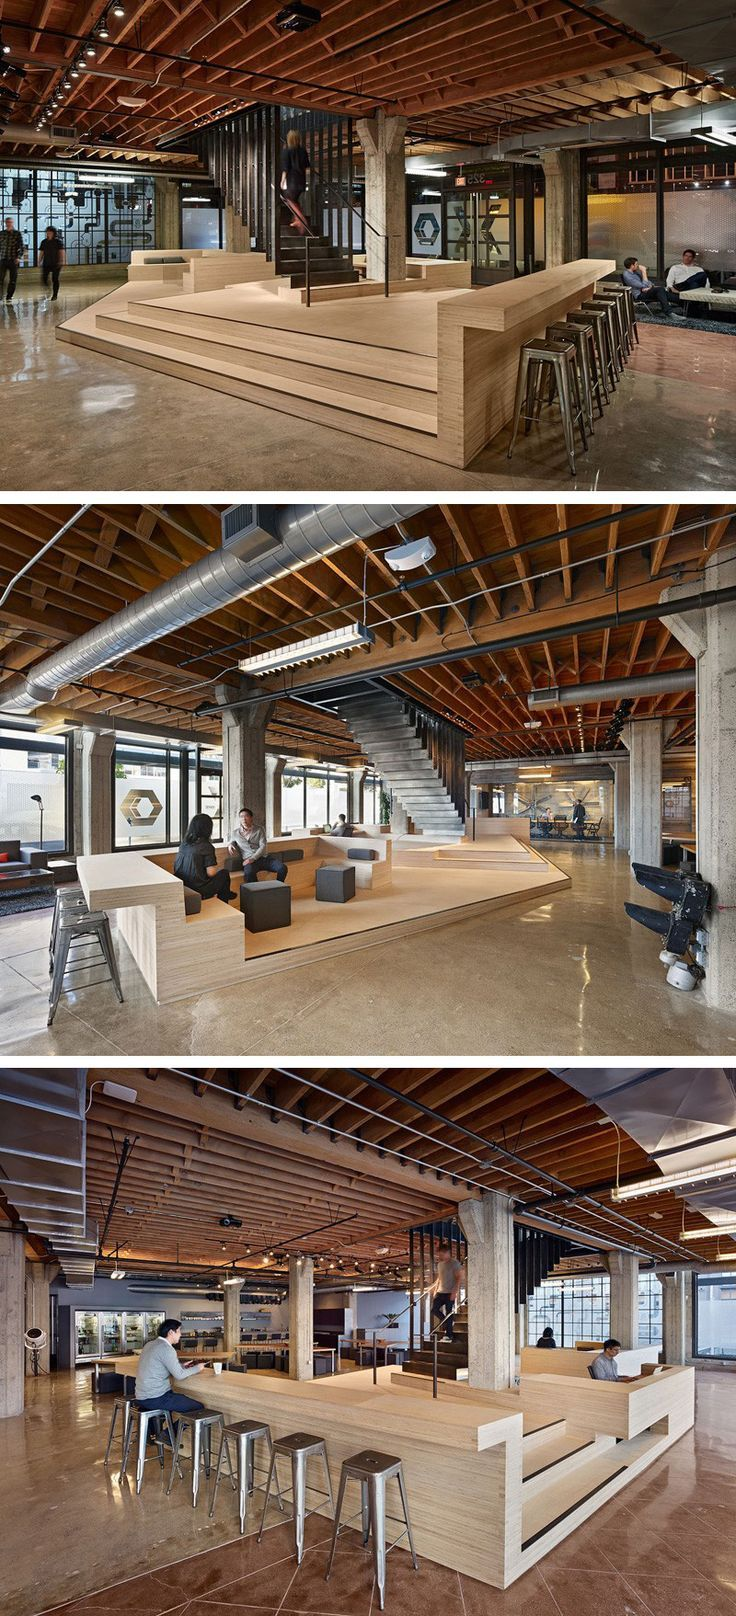 Iwamotoscott architecture designed the offices of heavybit - Office interior design san francisco ...